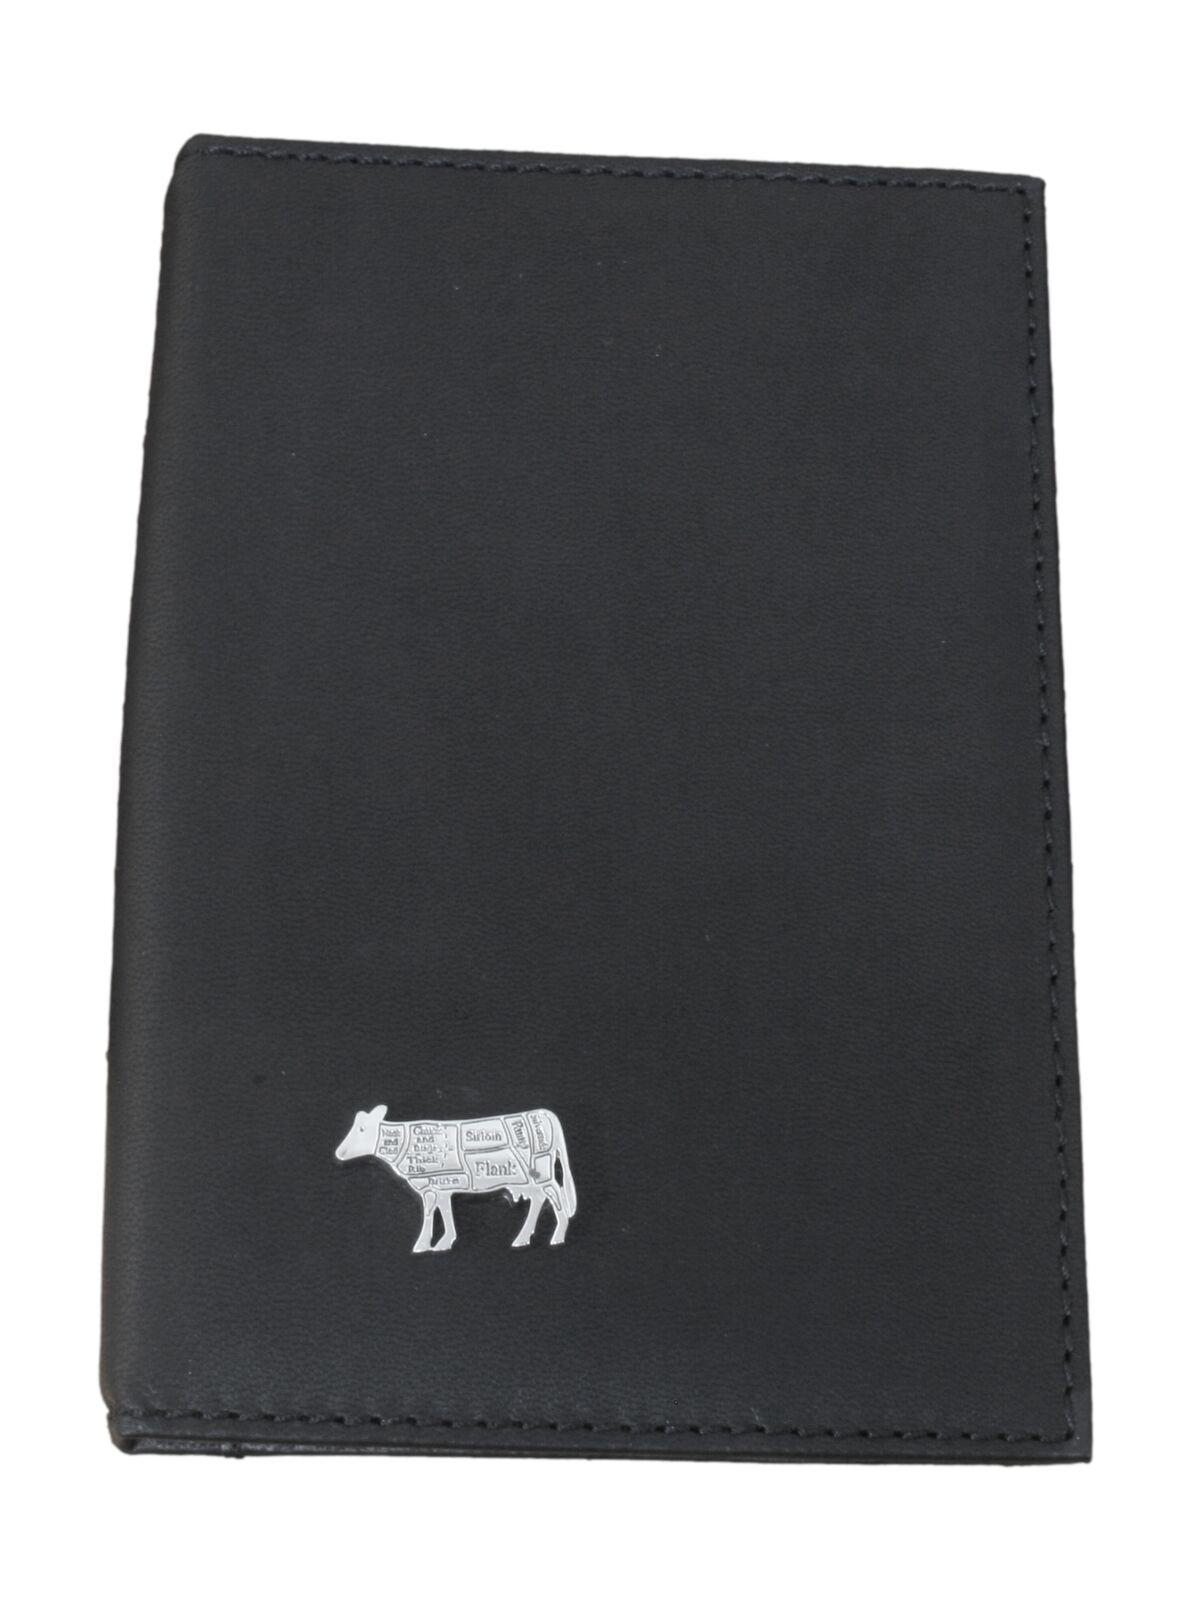 Butcher Cow Black Leather Shotgun/Firearms Certificate Holder 48